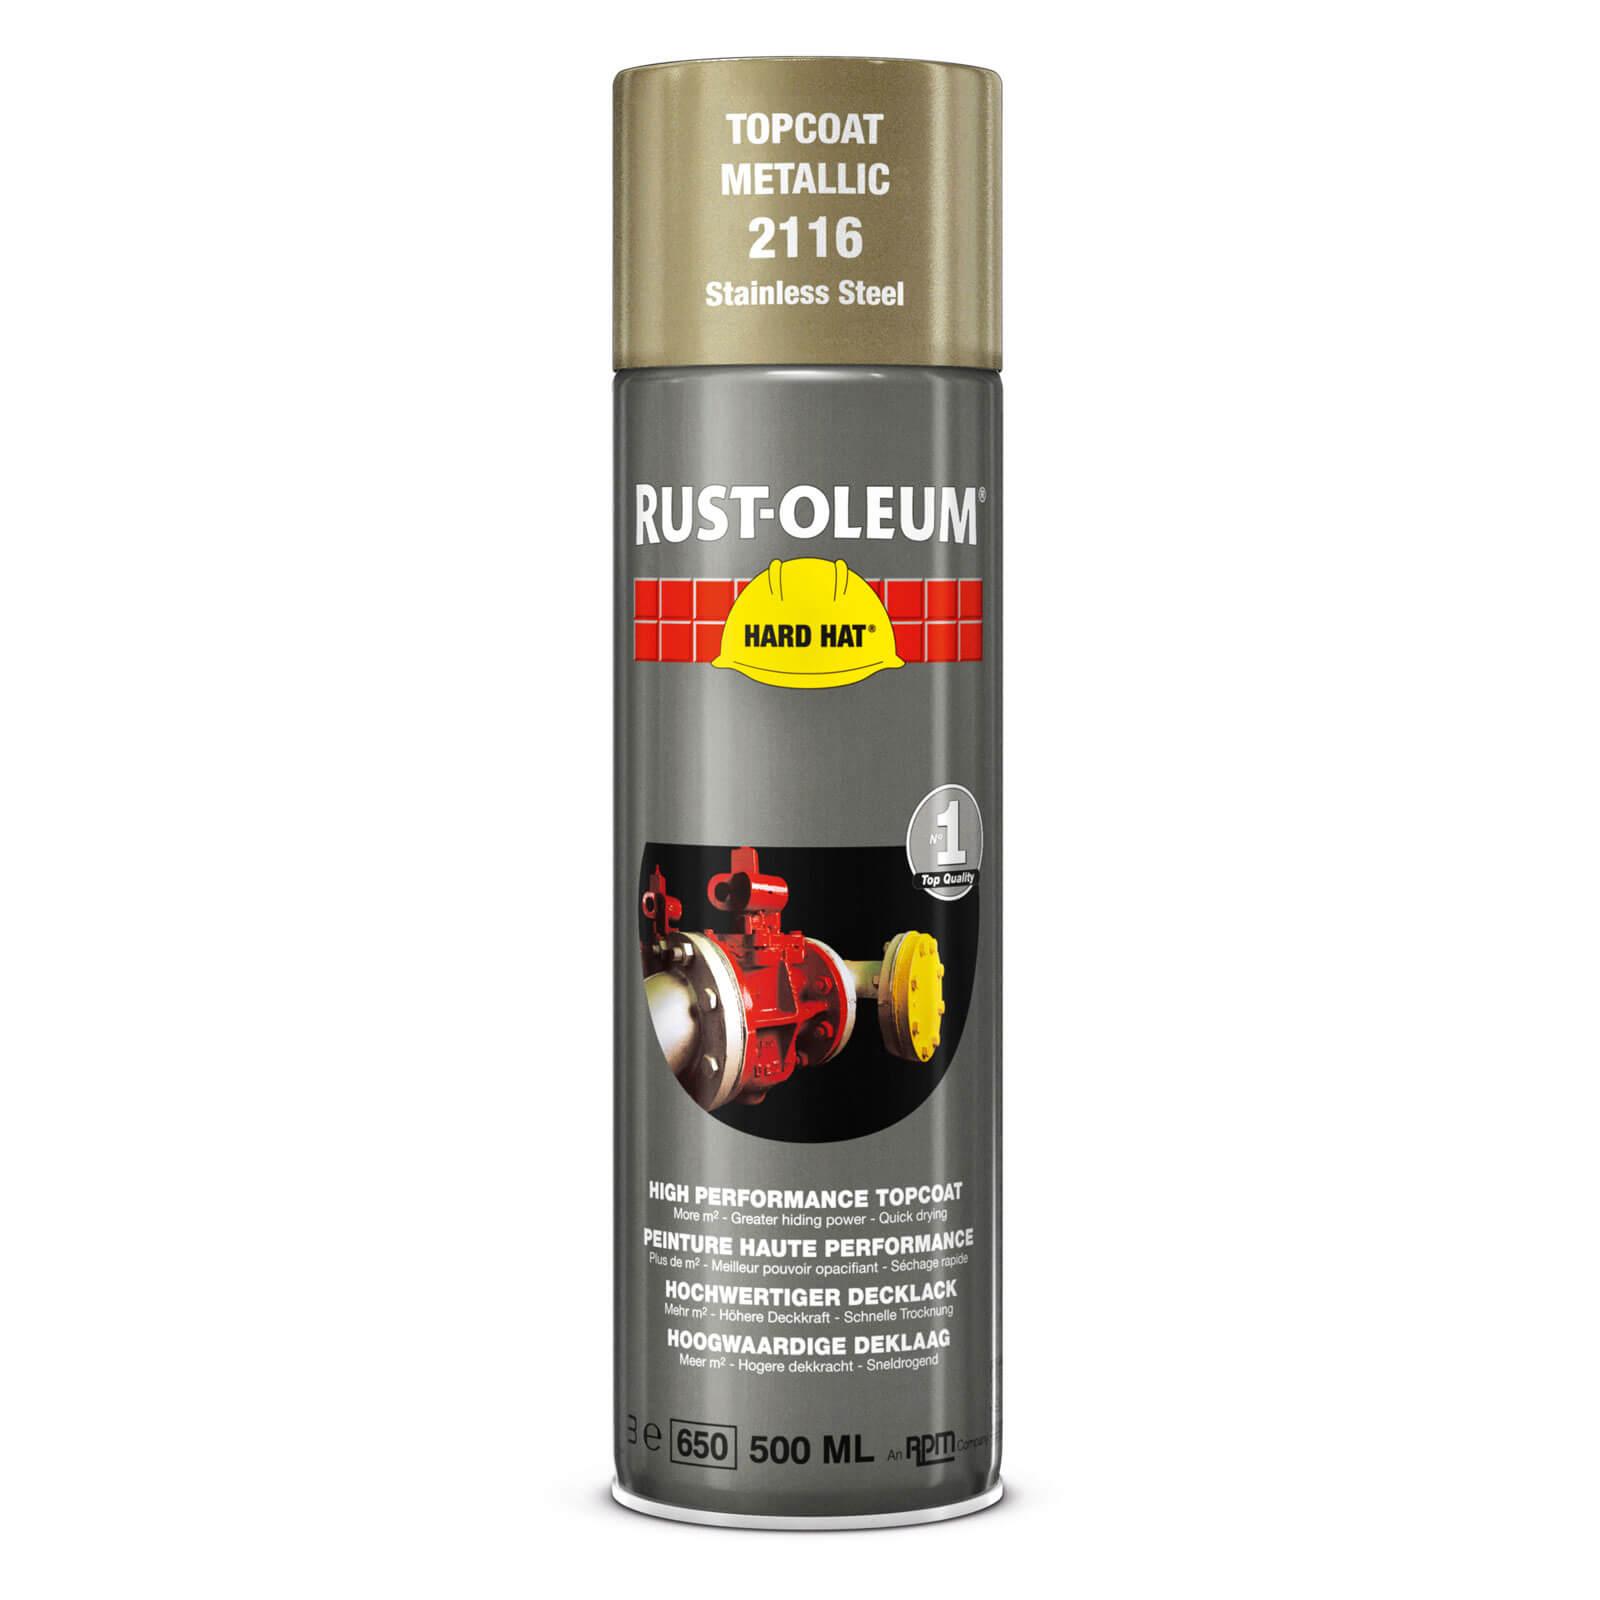 Rust Oleum Hard Hat Stainless Steel Spray Paint Stainless Steel 500ml